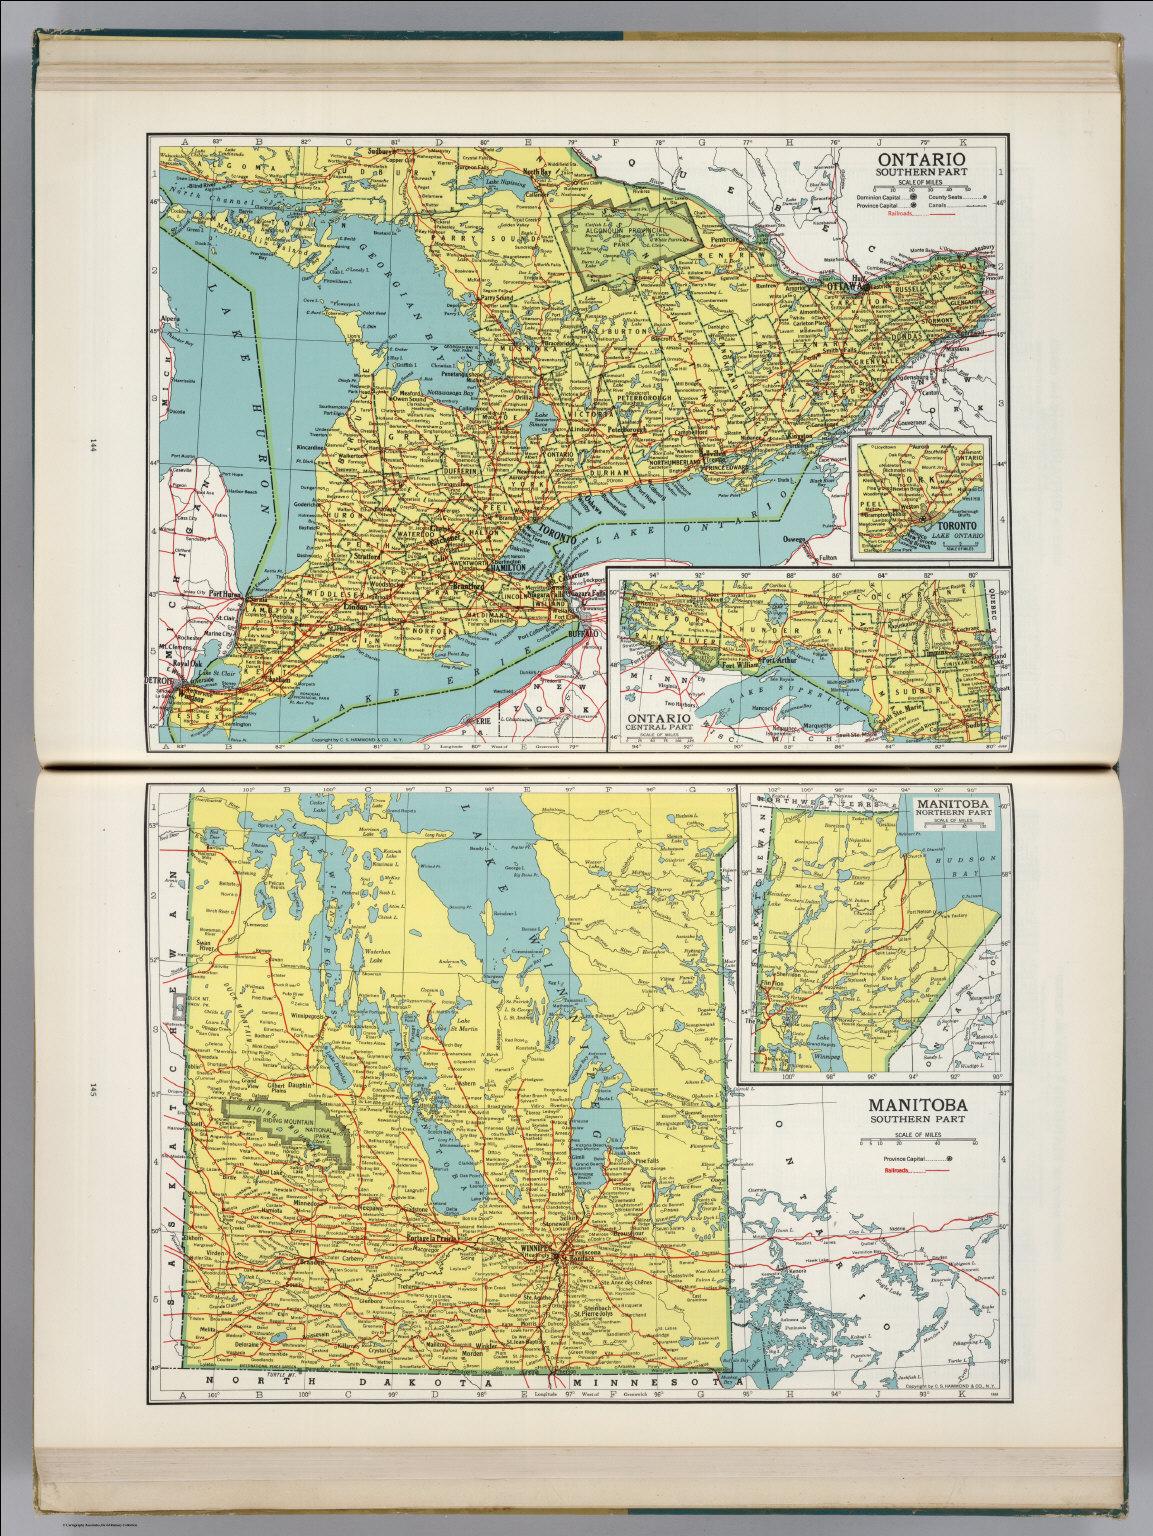 Ontario Manitoba David Rumsey Historical Map Collection